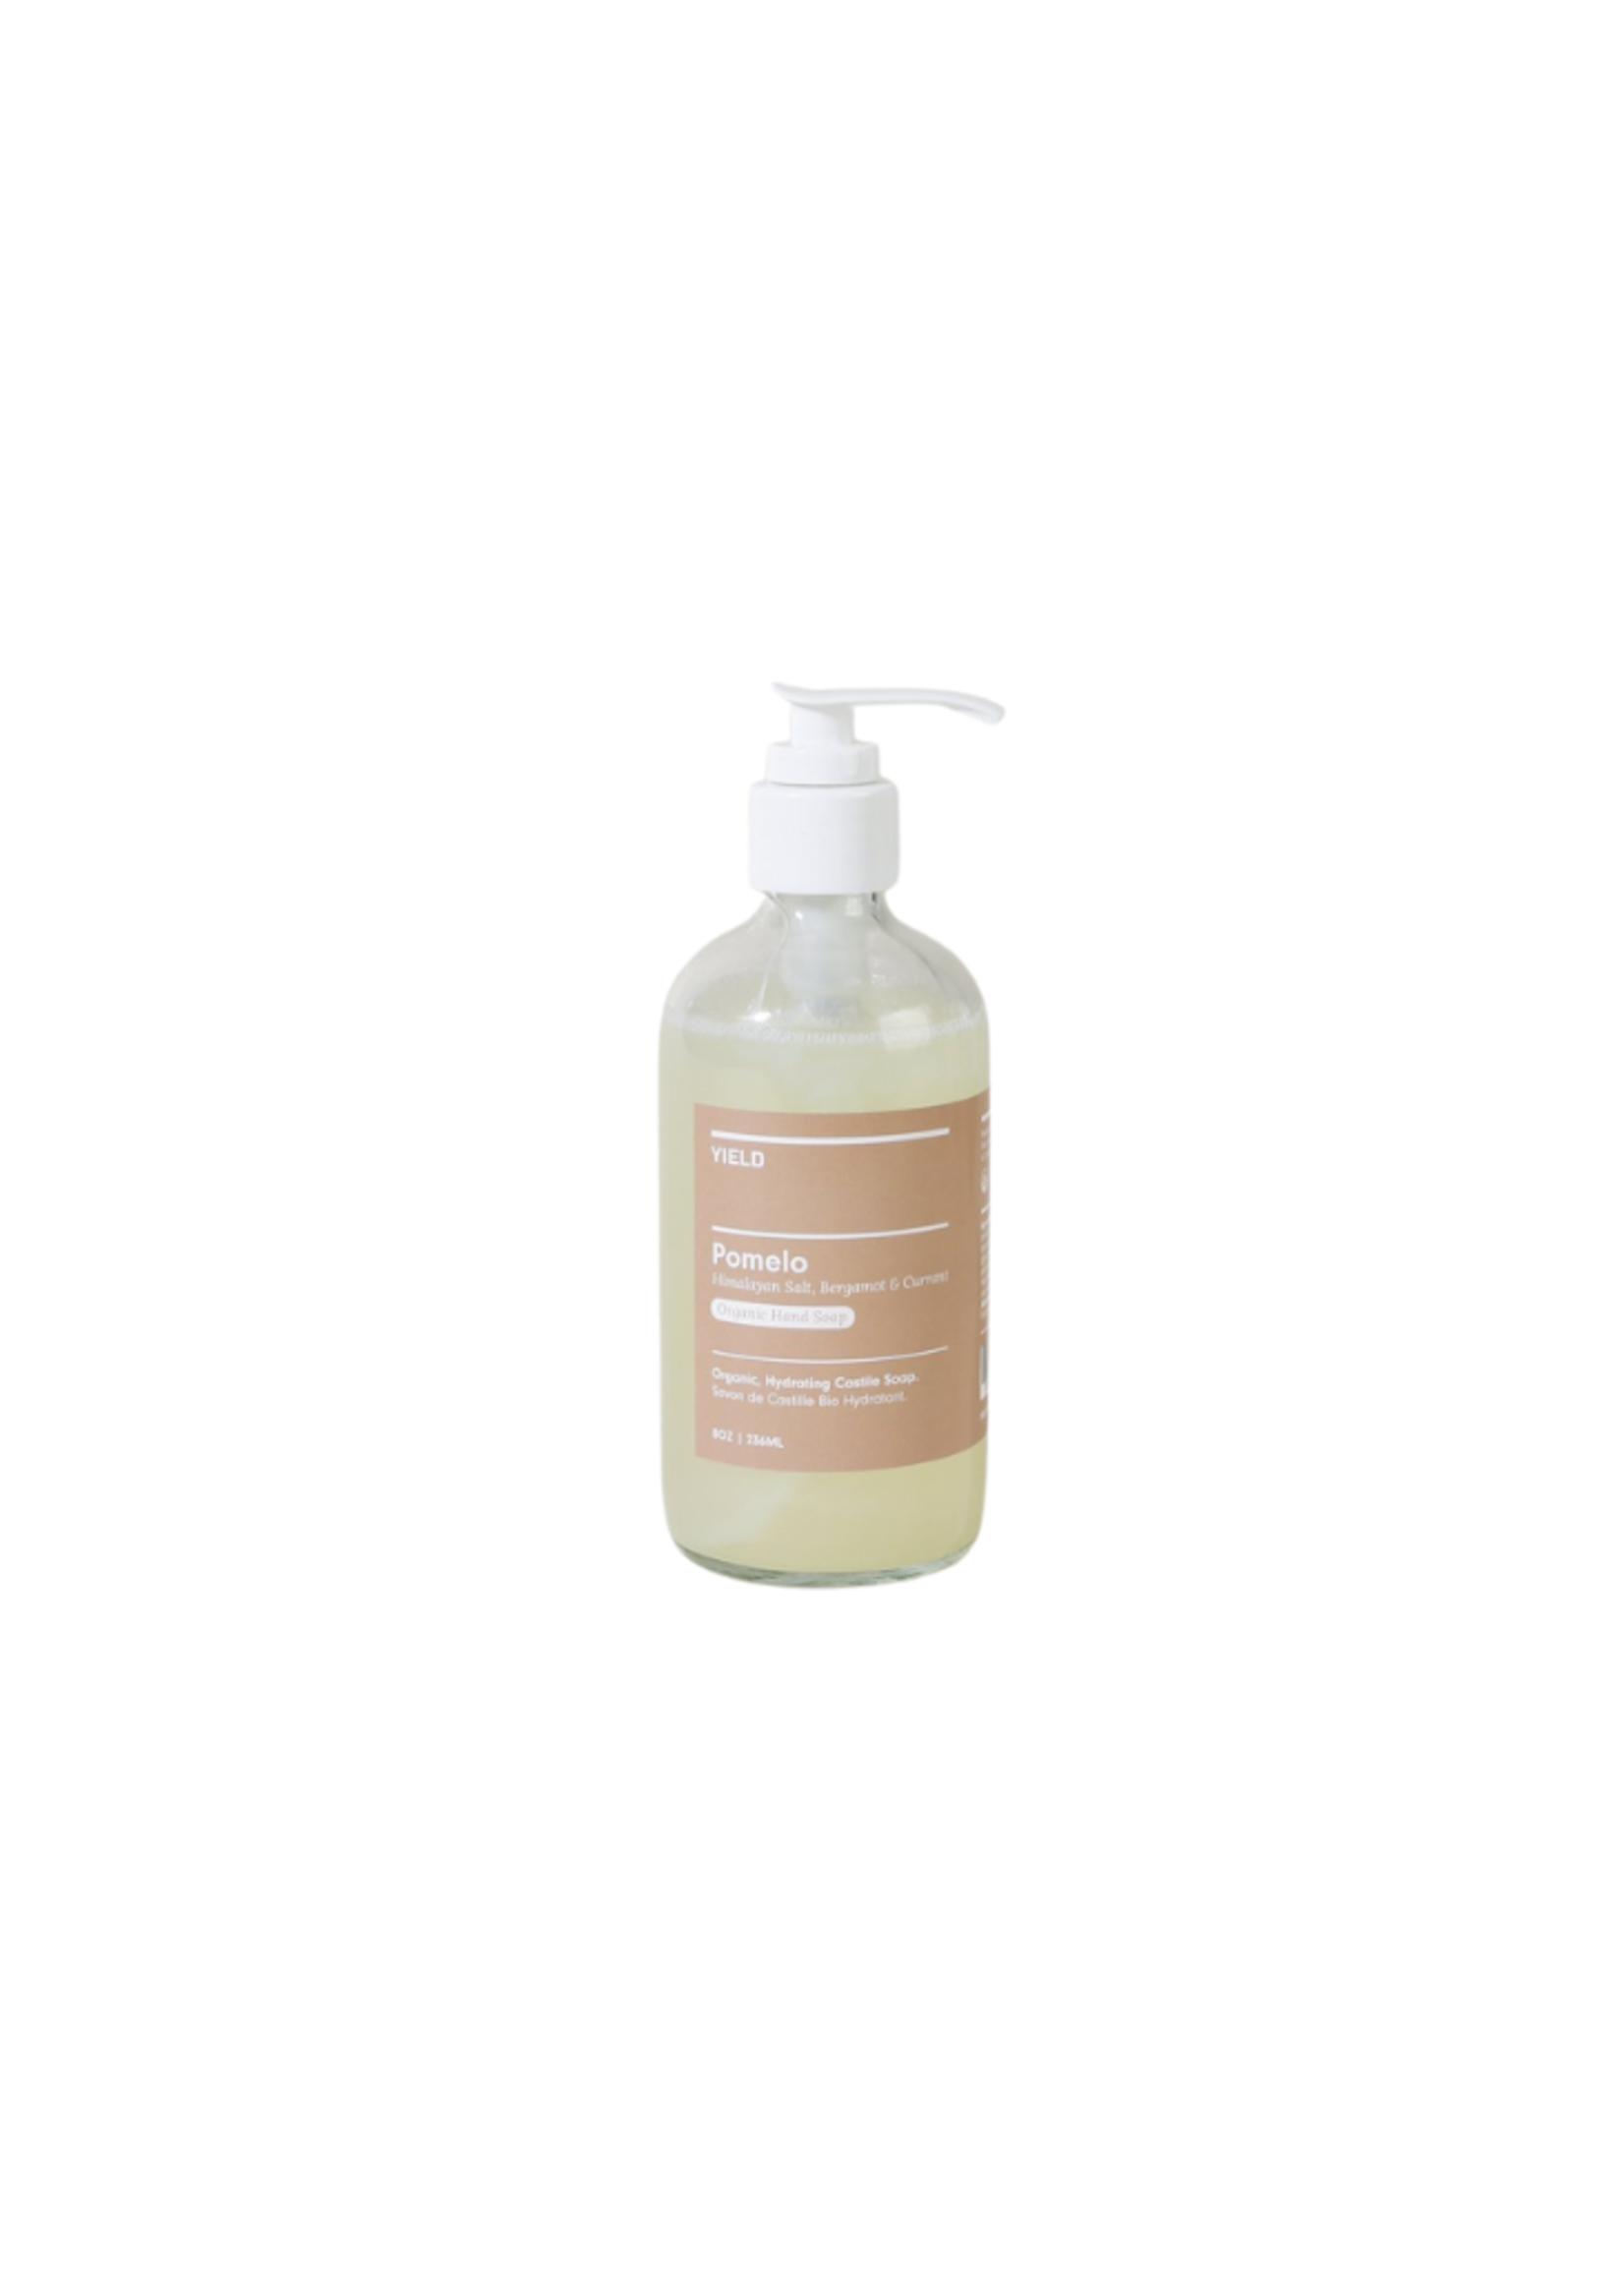 Yield Design Co Pomelo Organic Hand Soap - 8oz Bottle